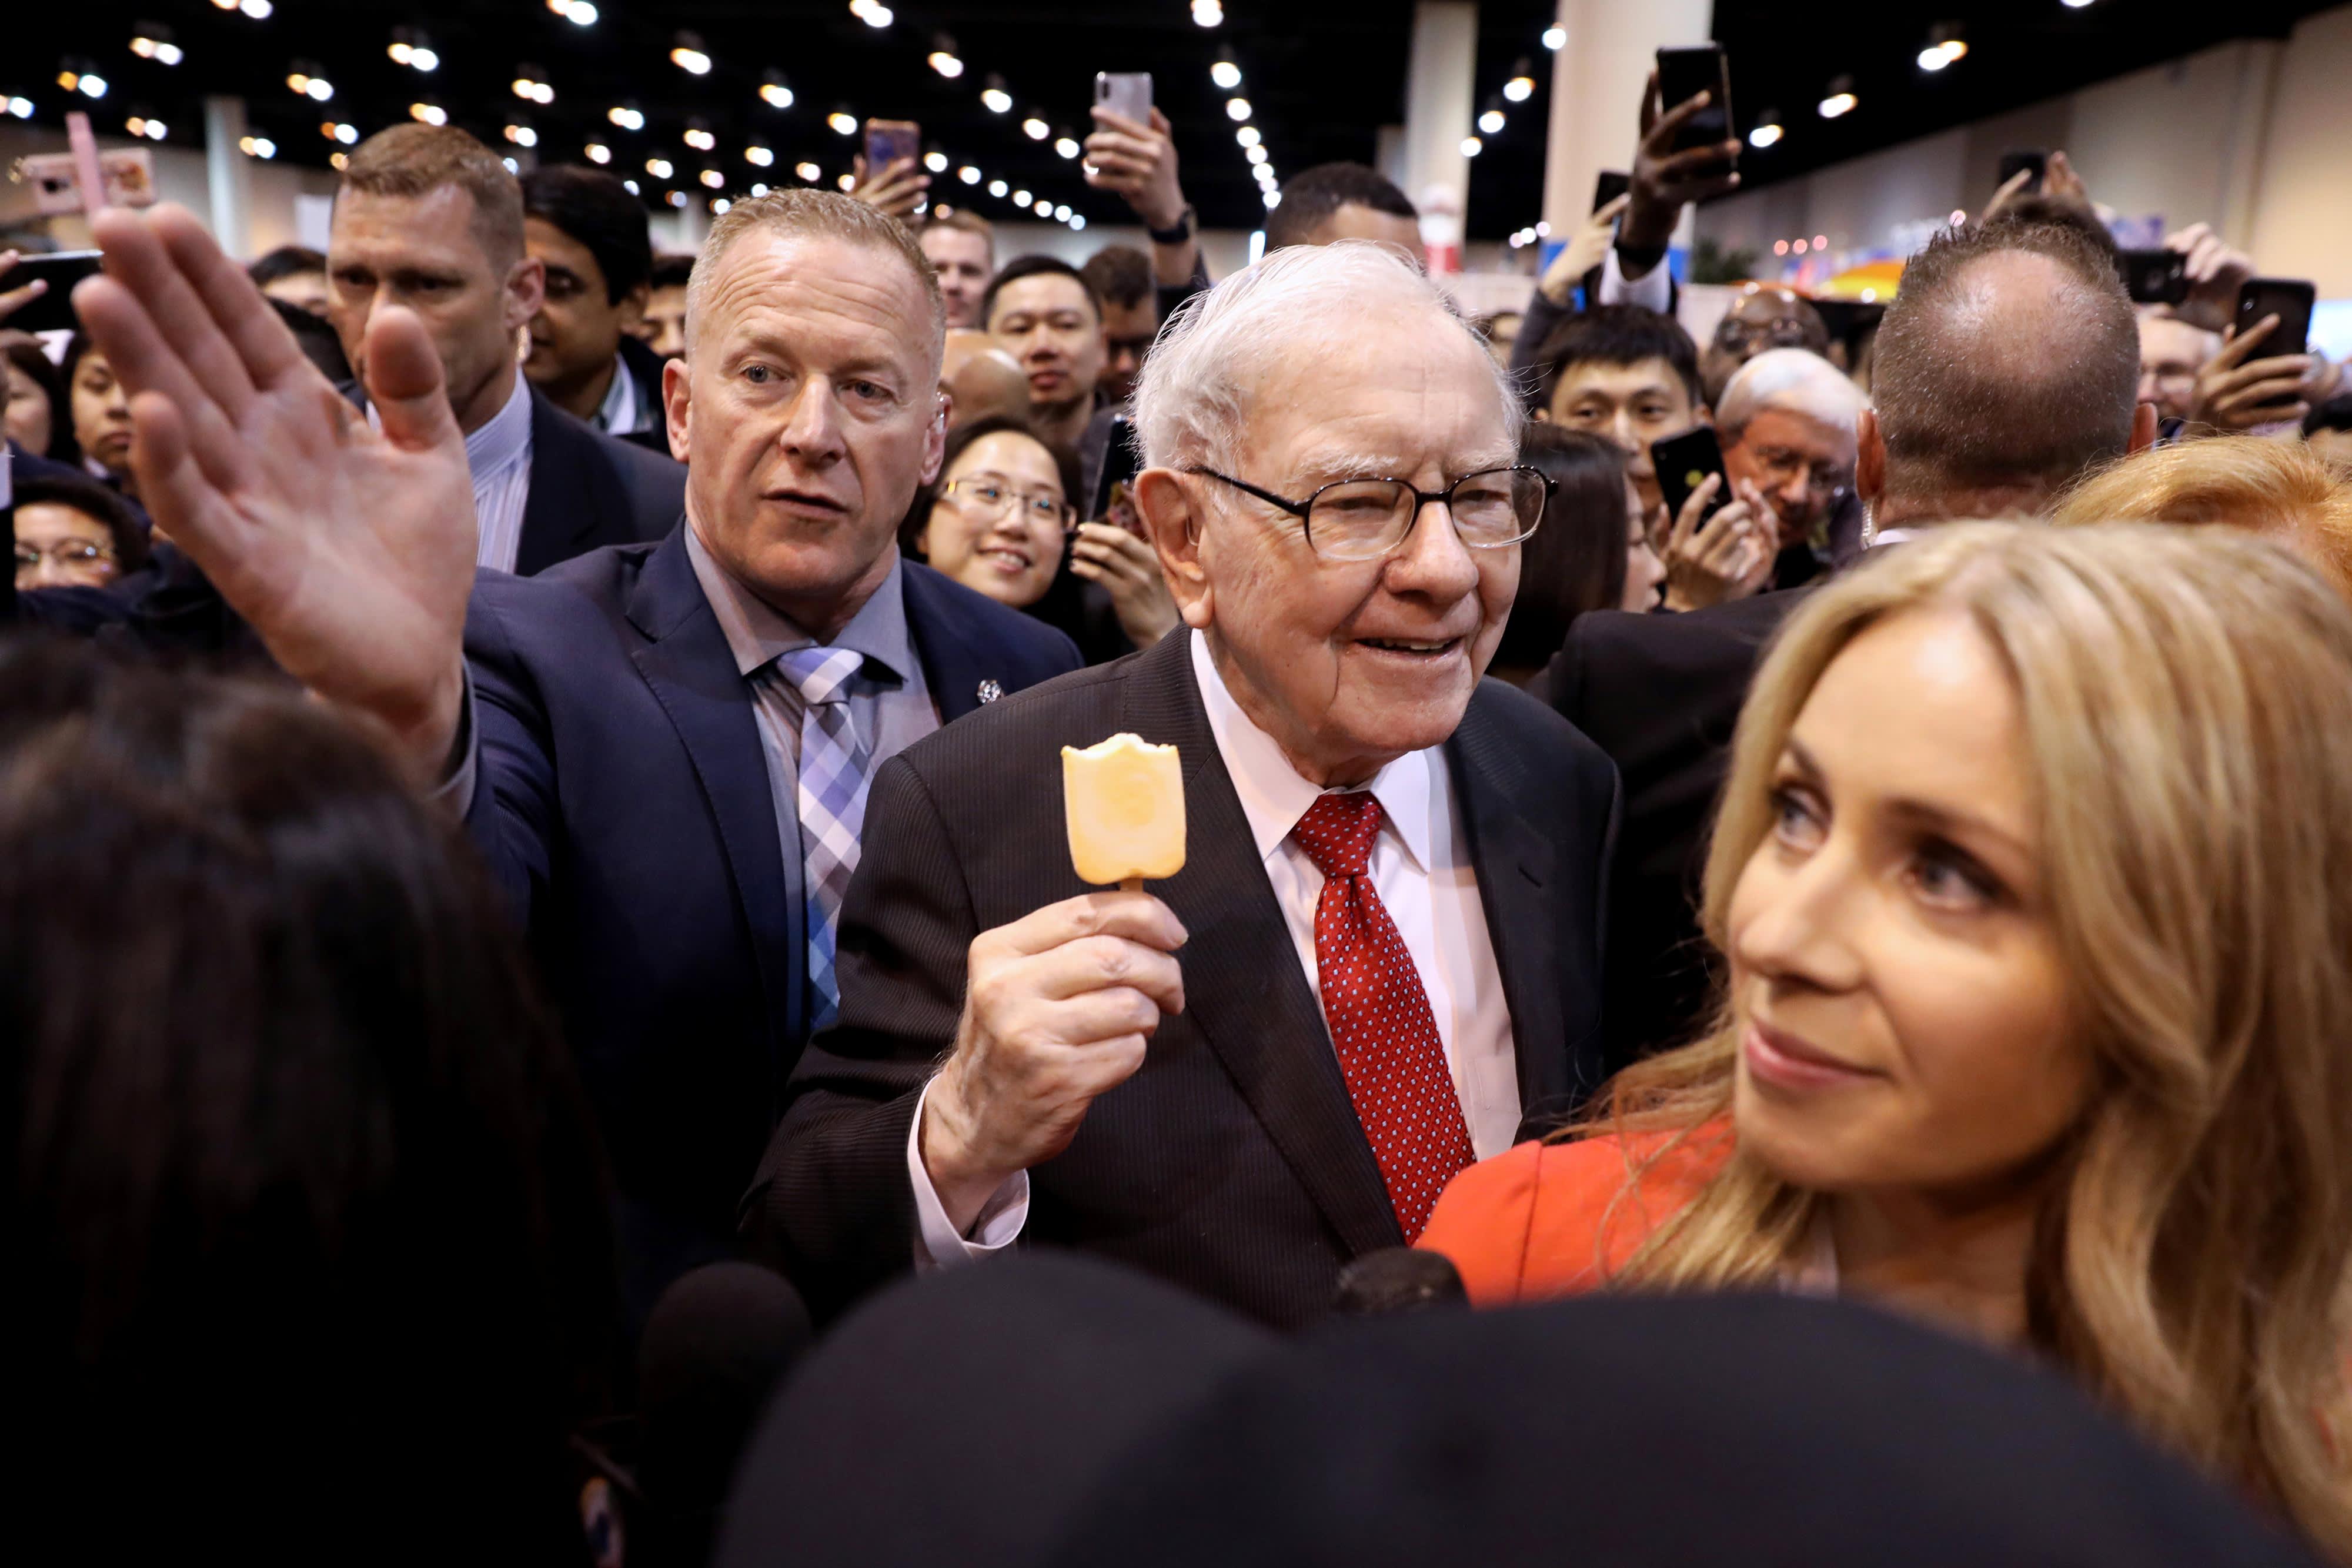 As Warren Buffett turns 91, the legendary investor prepares Berkshire Hathaway for a new economy